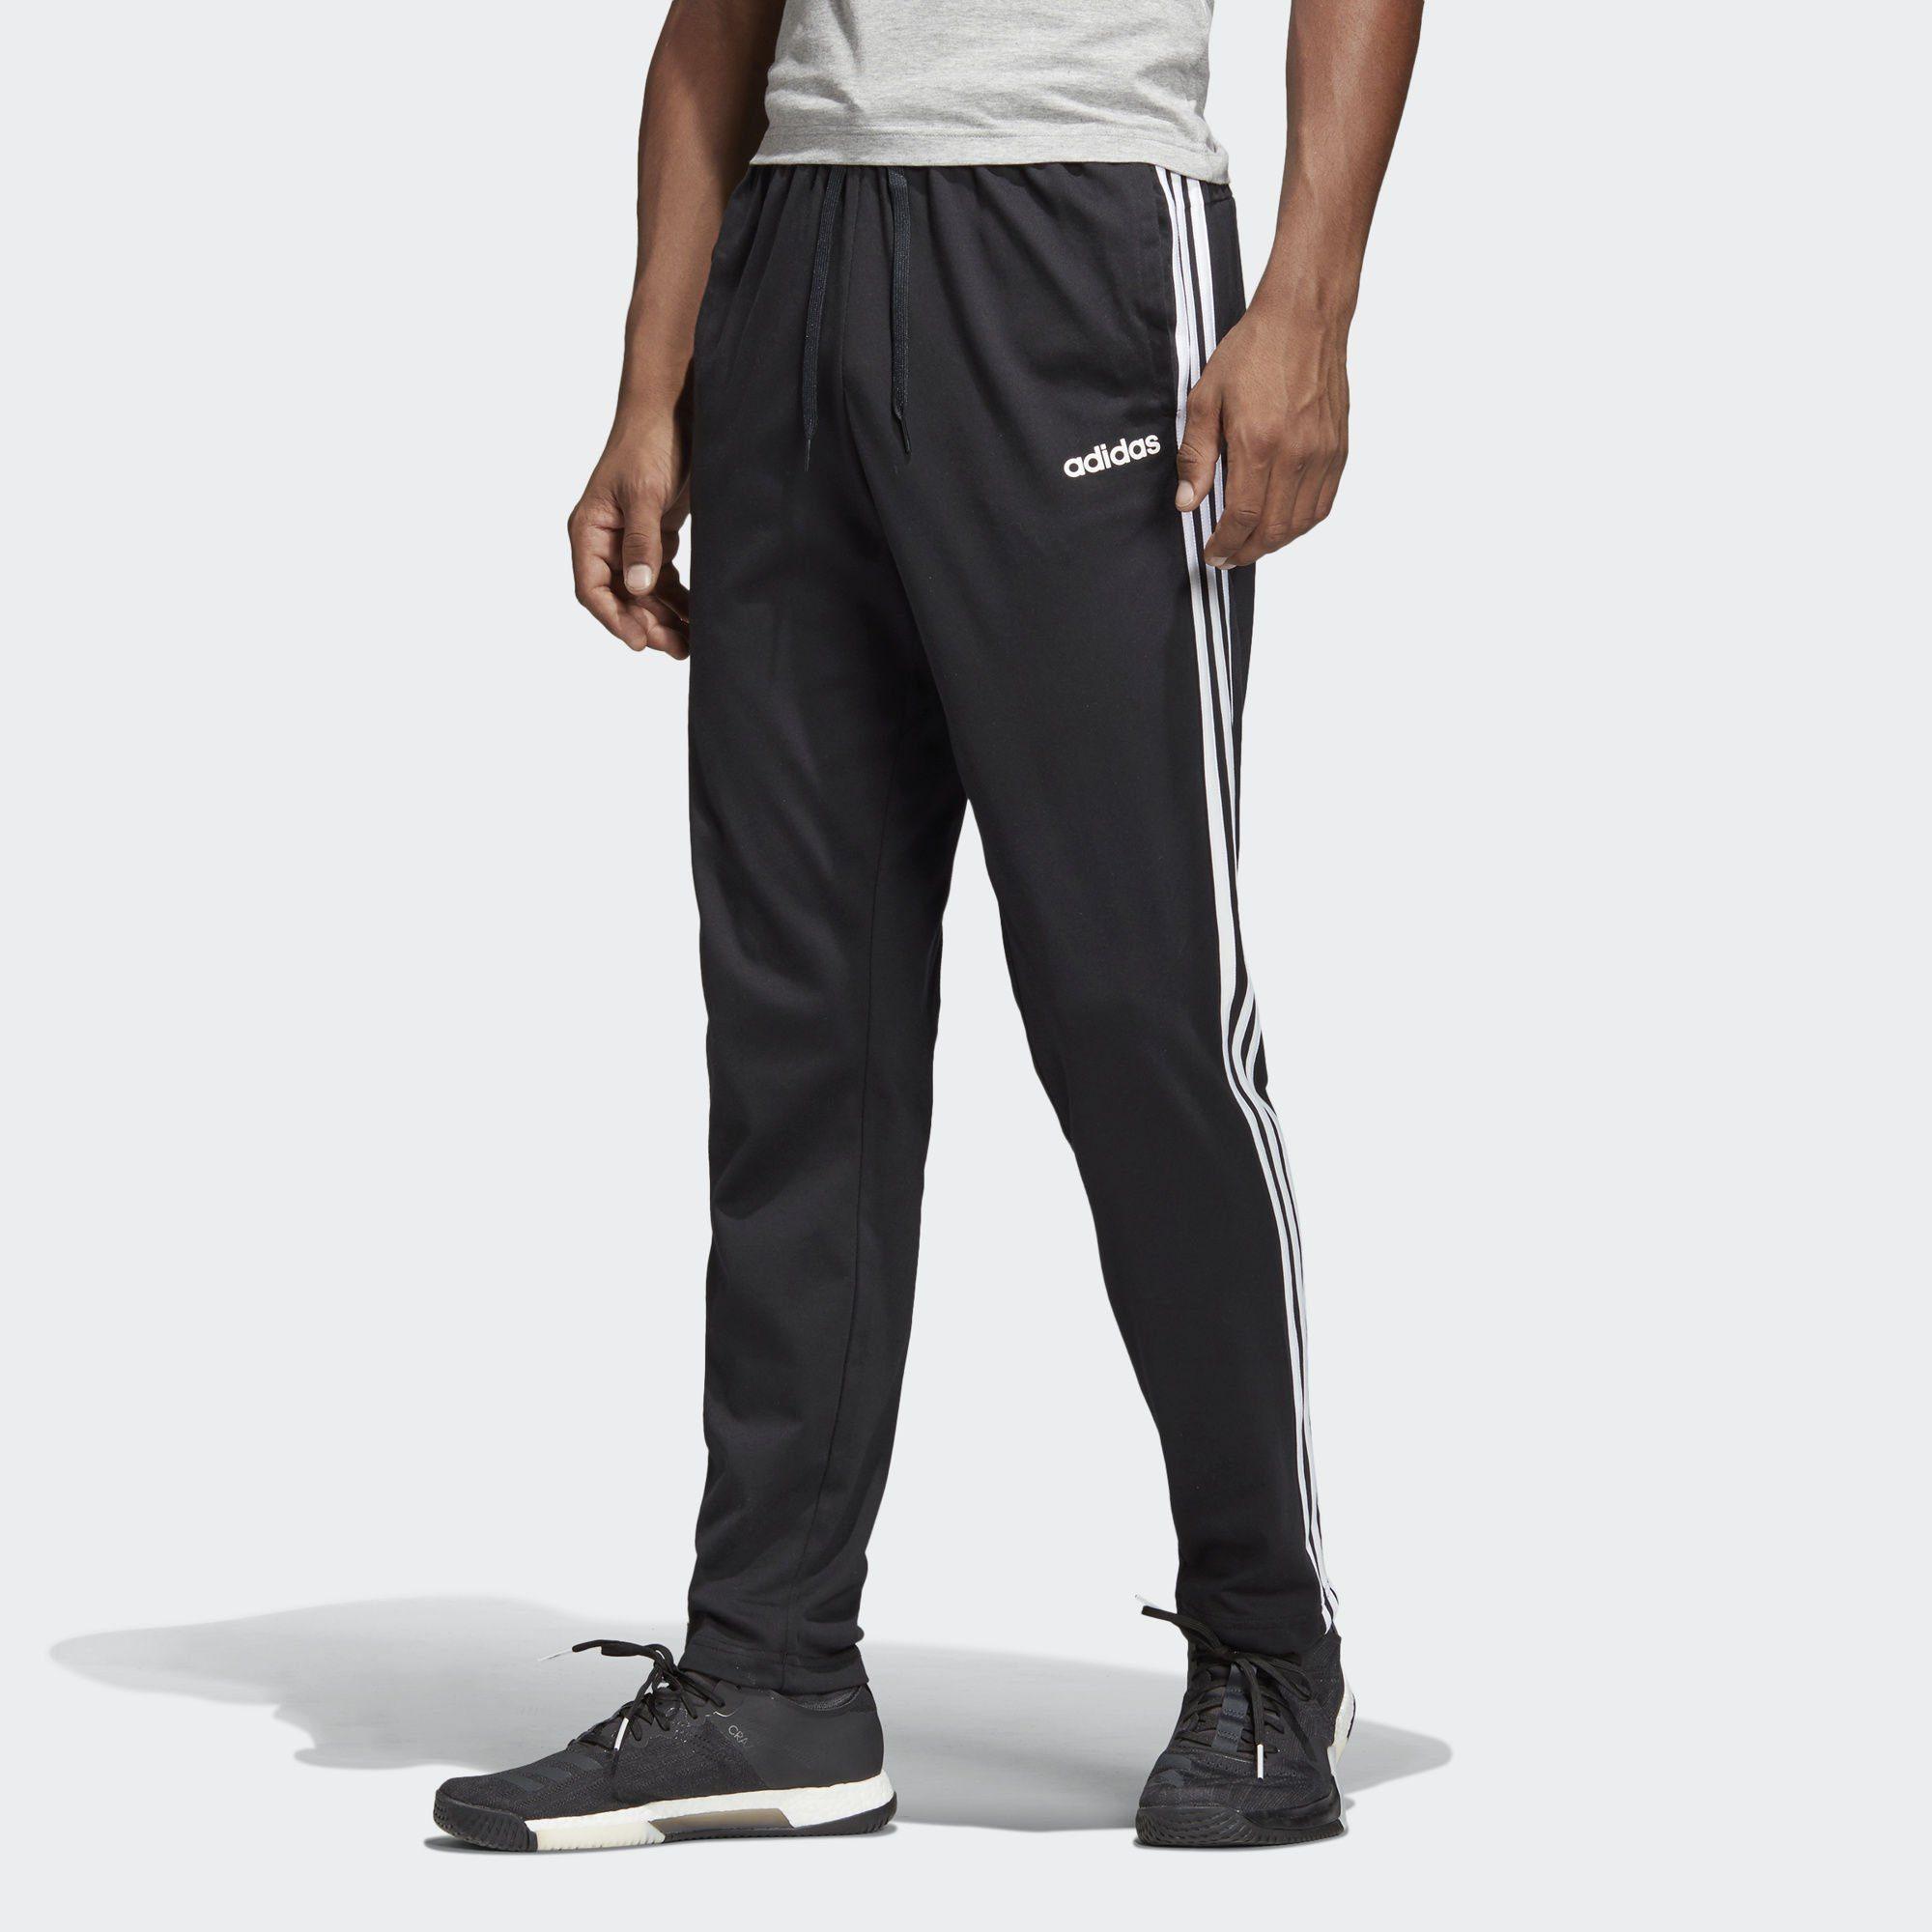 OTTO | Herren adidas Performance Jogginghose ZNE 36H pant